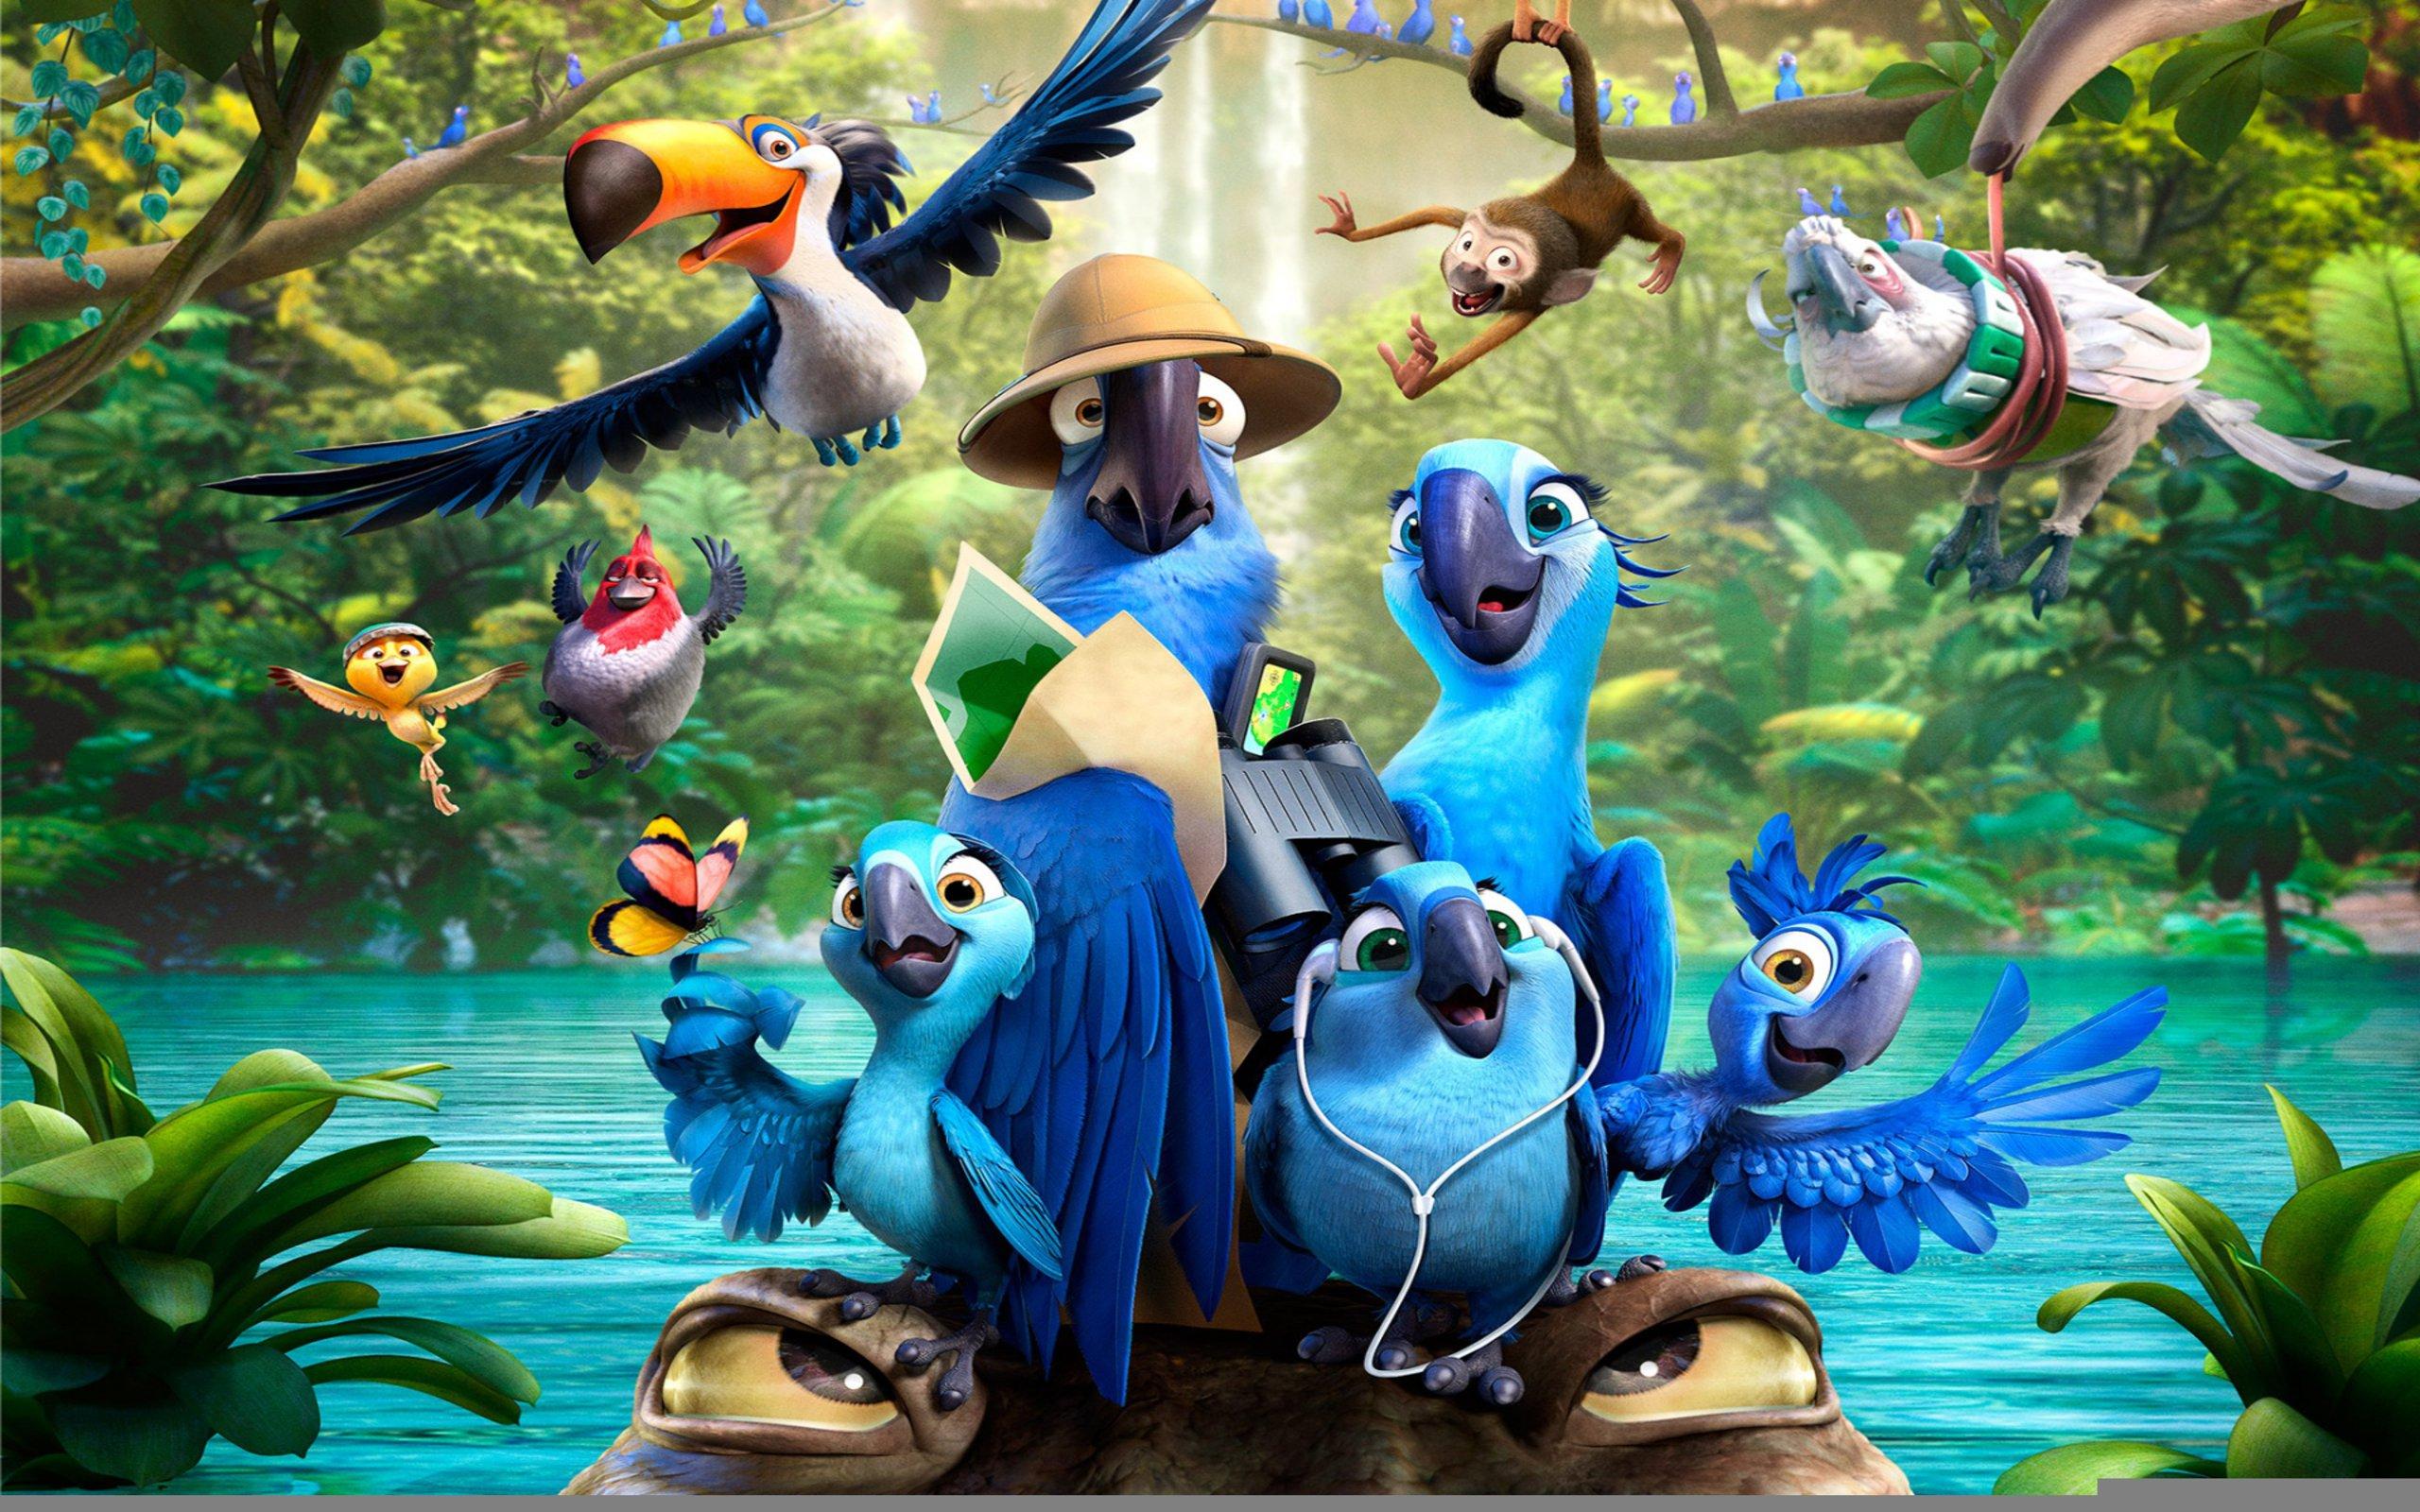 Rio 2 Cartoon Movie wallpaper | 2560x1600 | #9575